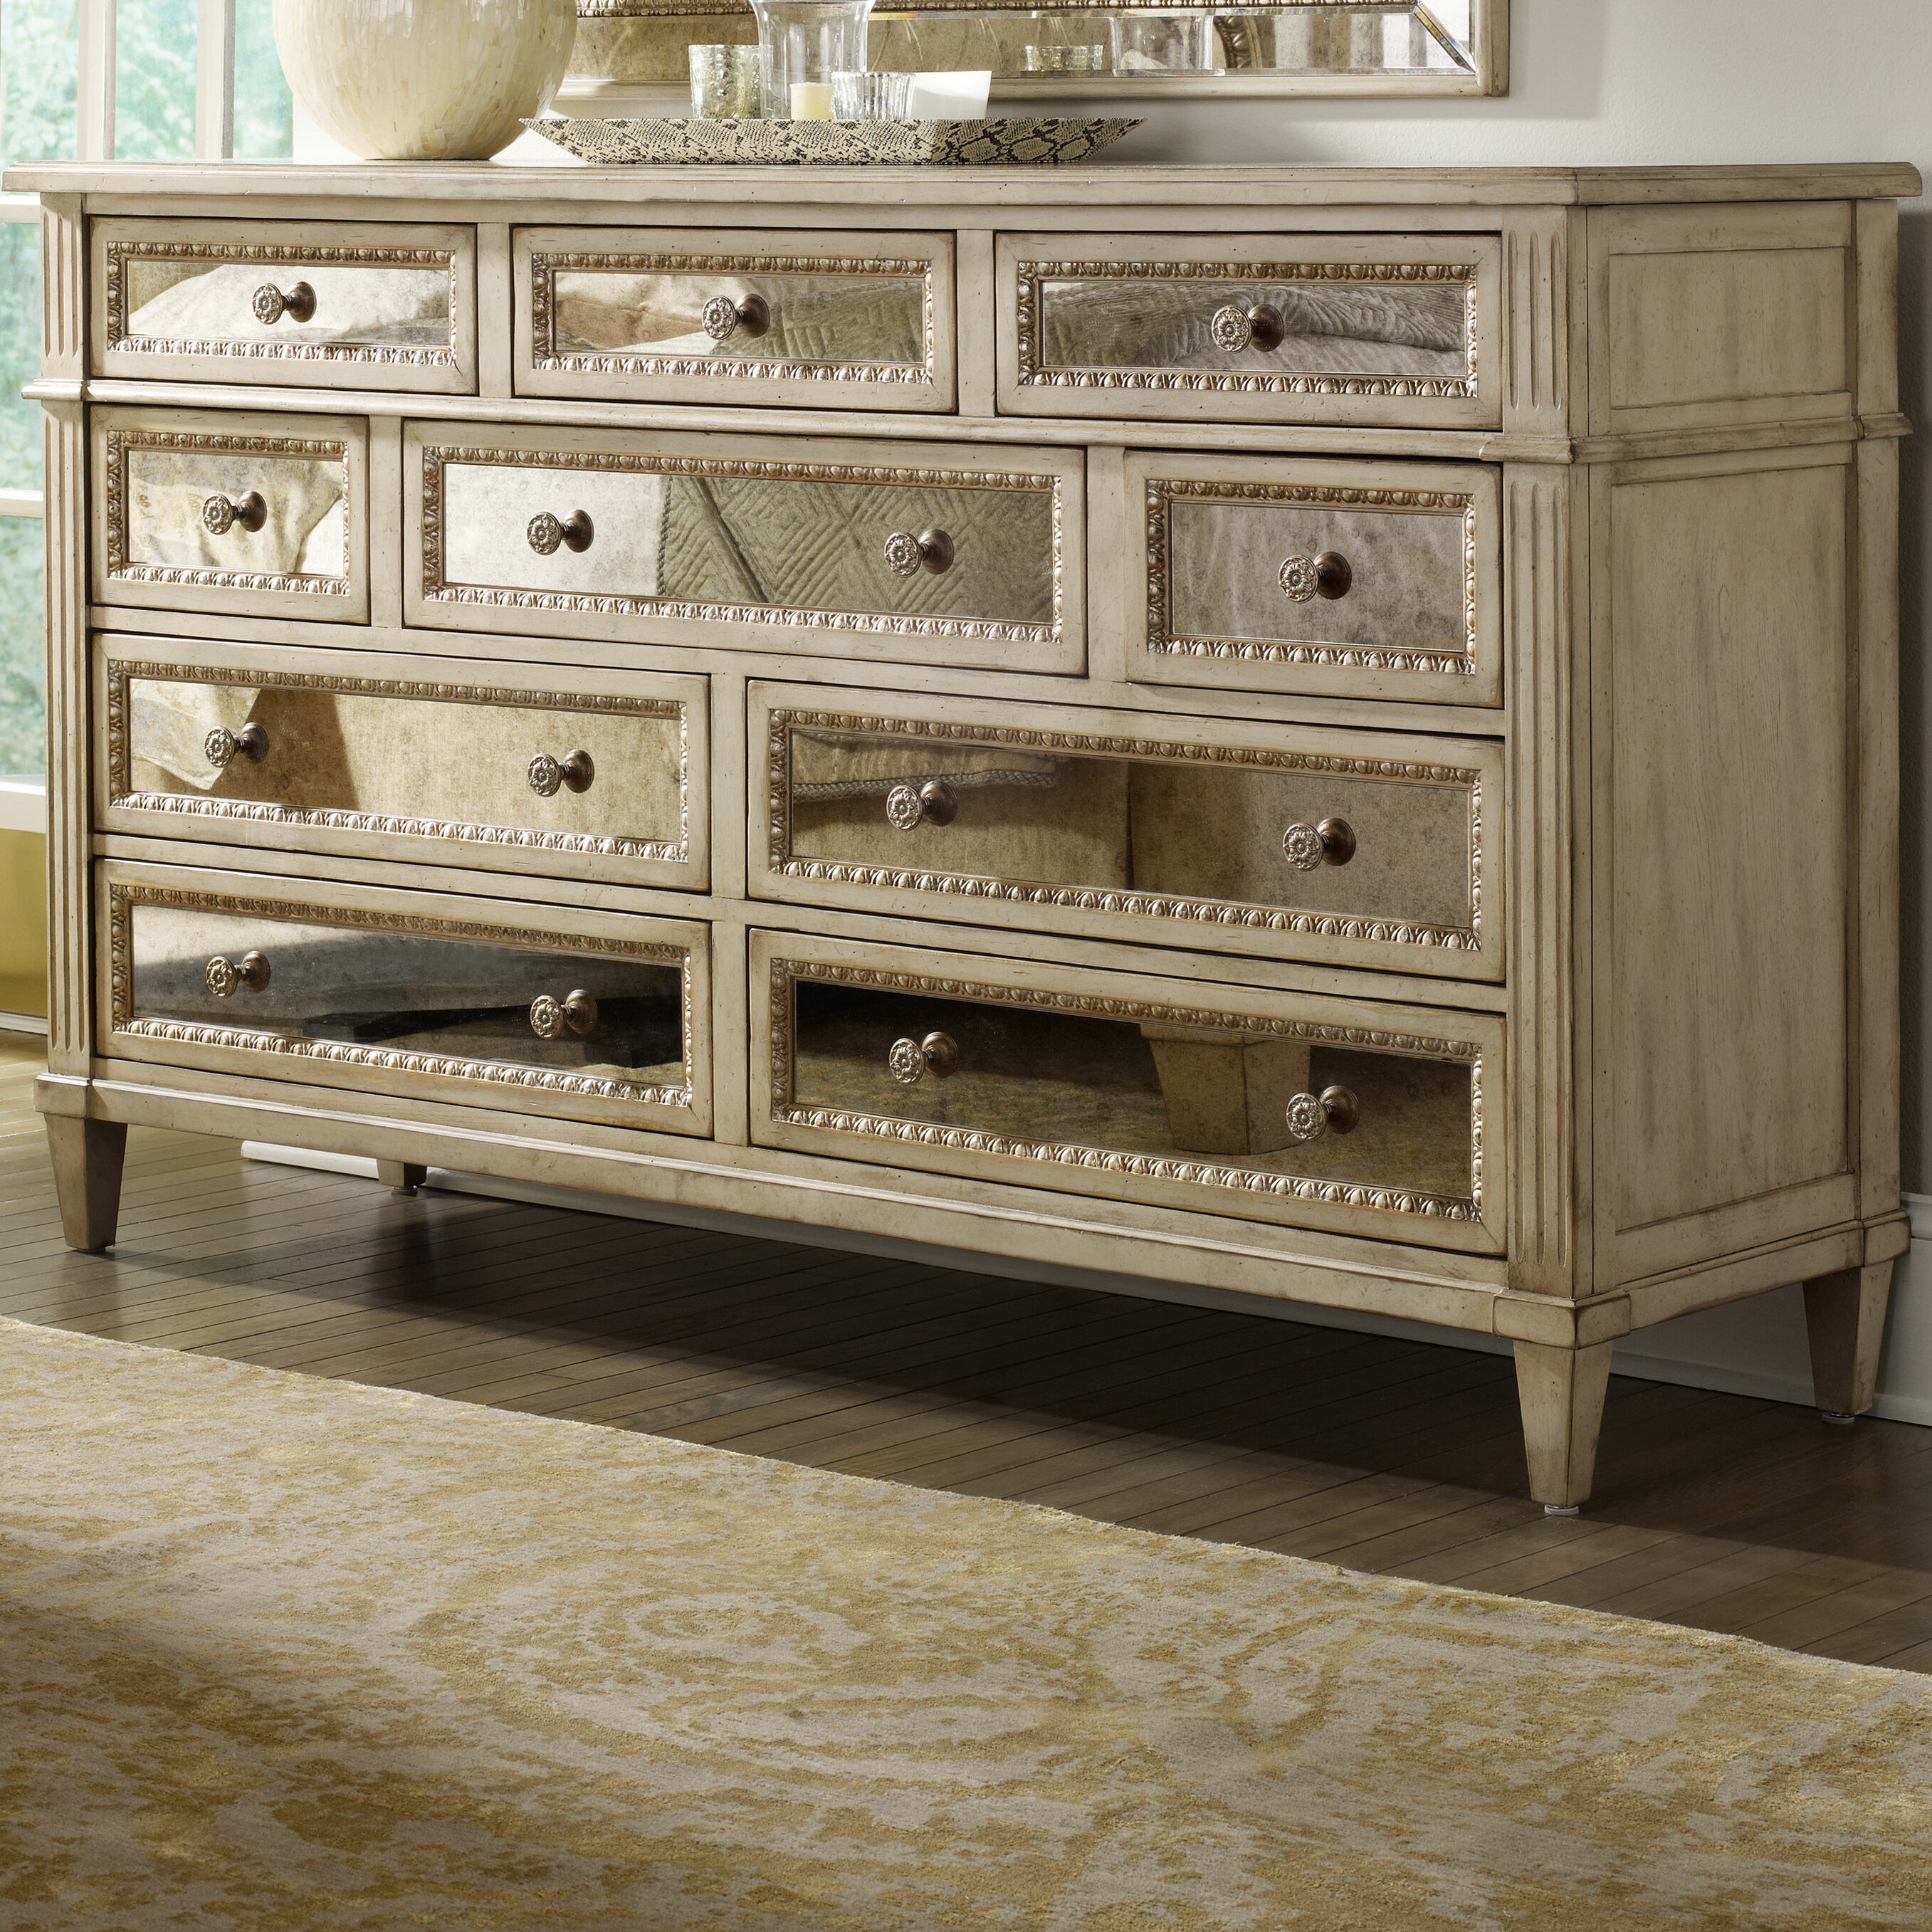 Hooker furniture sanctuary 10 drawer dresser reviews wayfair